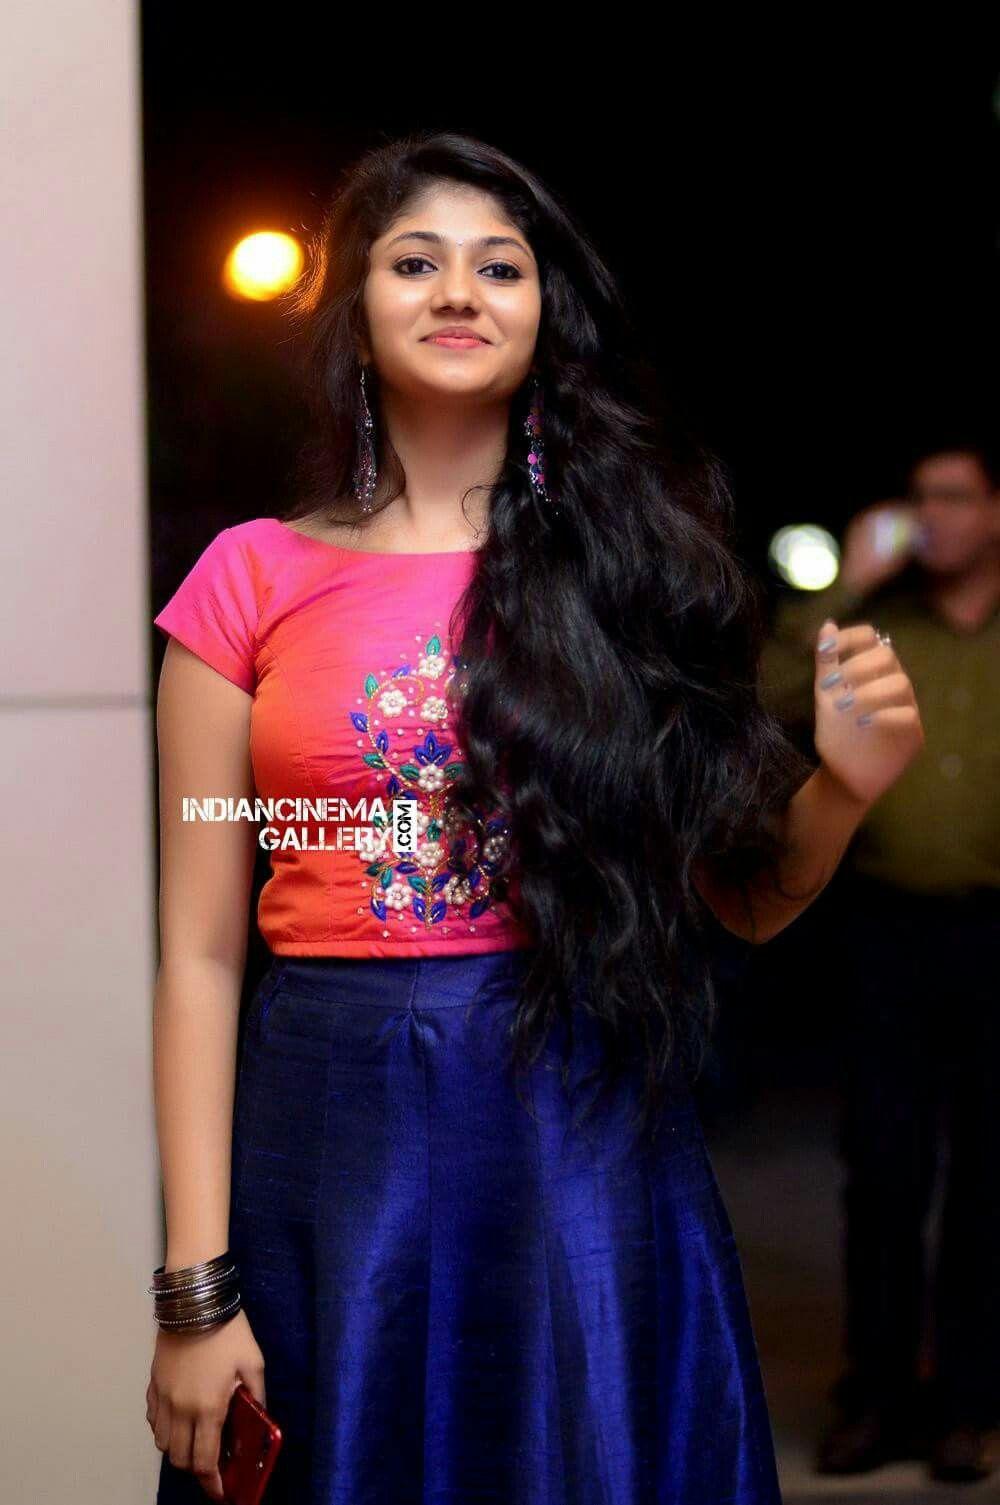 pin by rock star on drishya raghunath in 2019   long gown